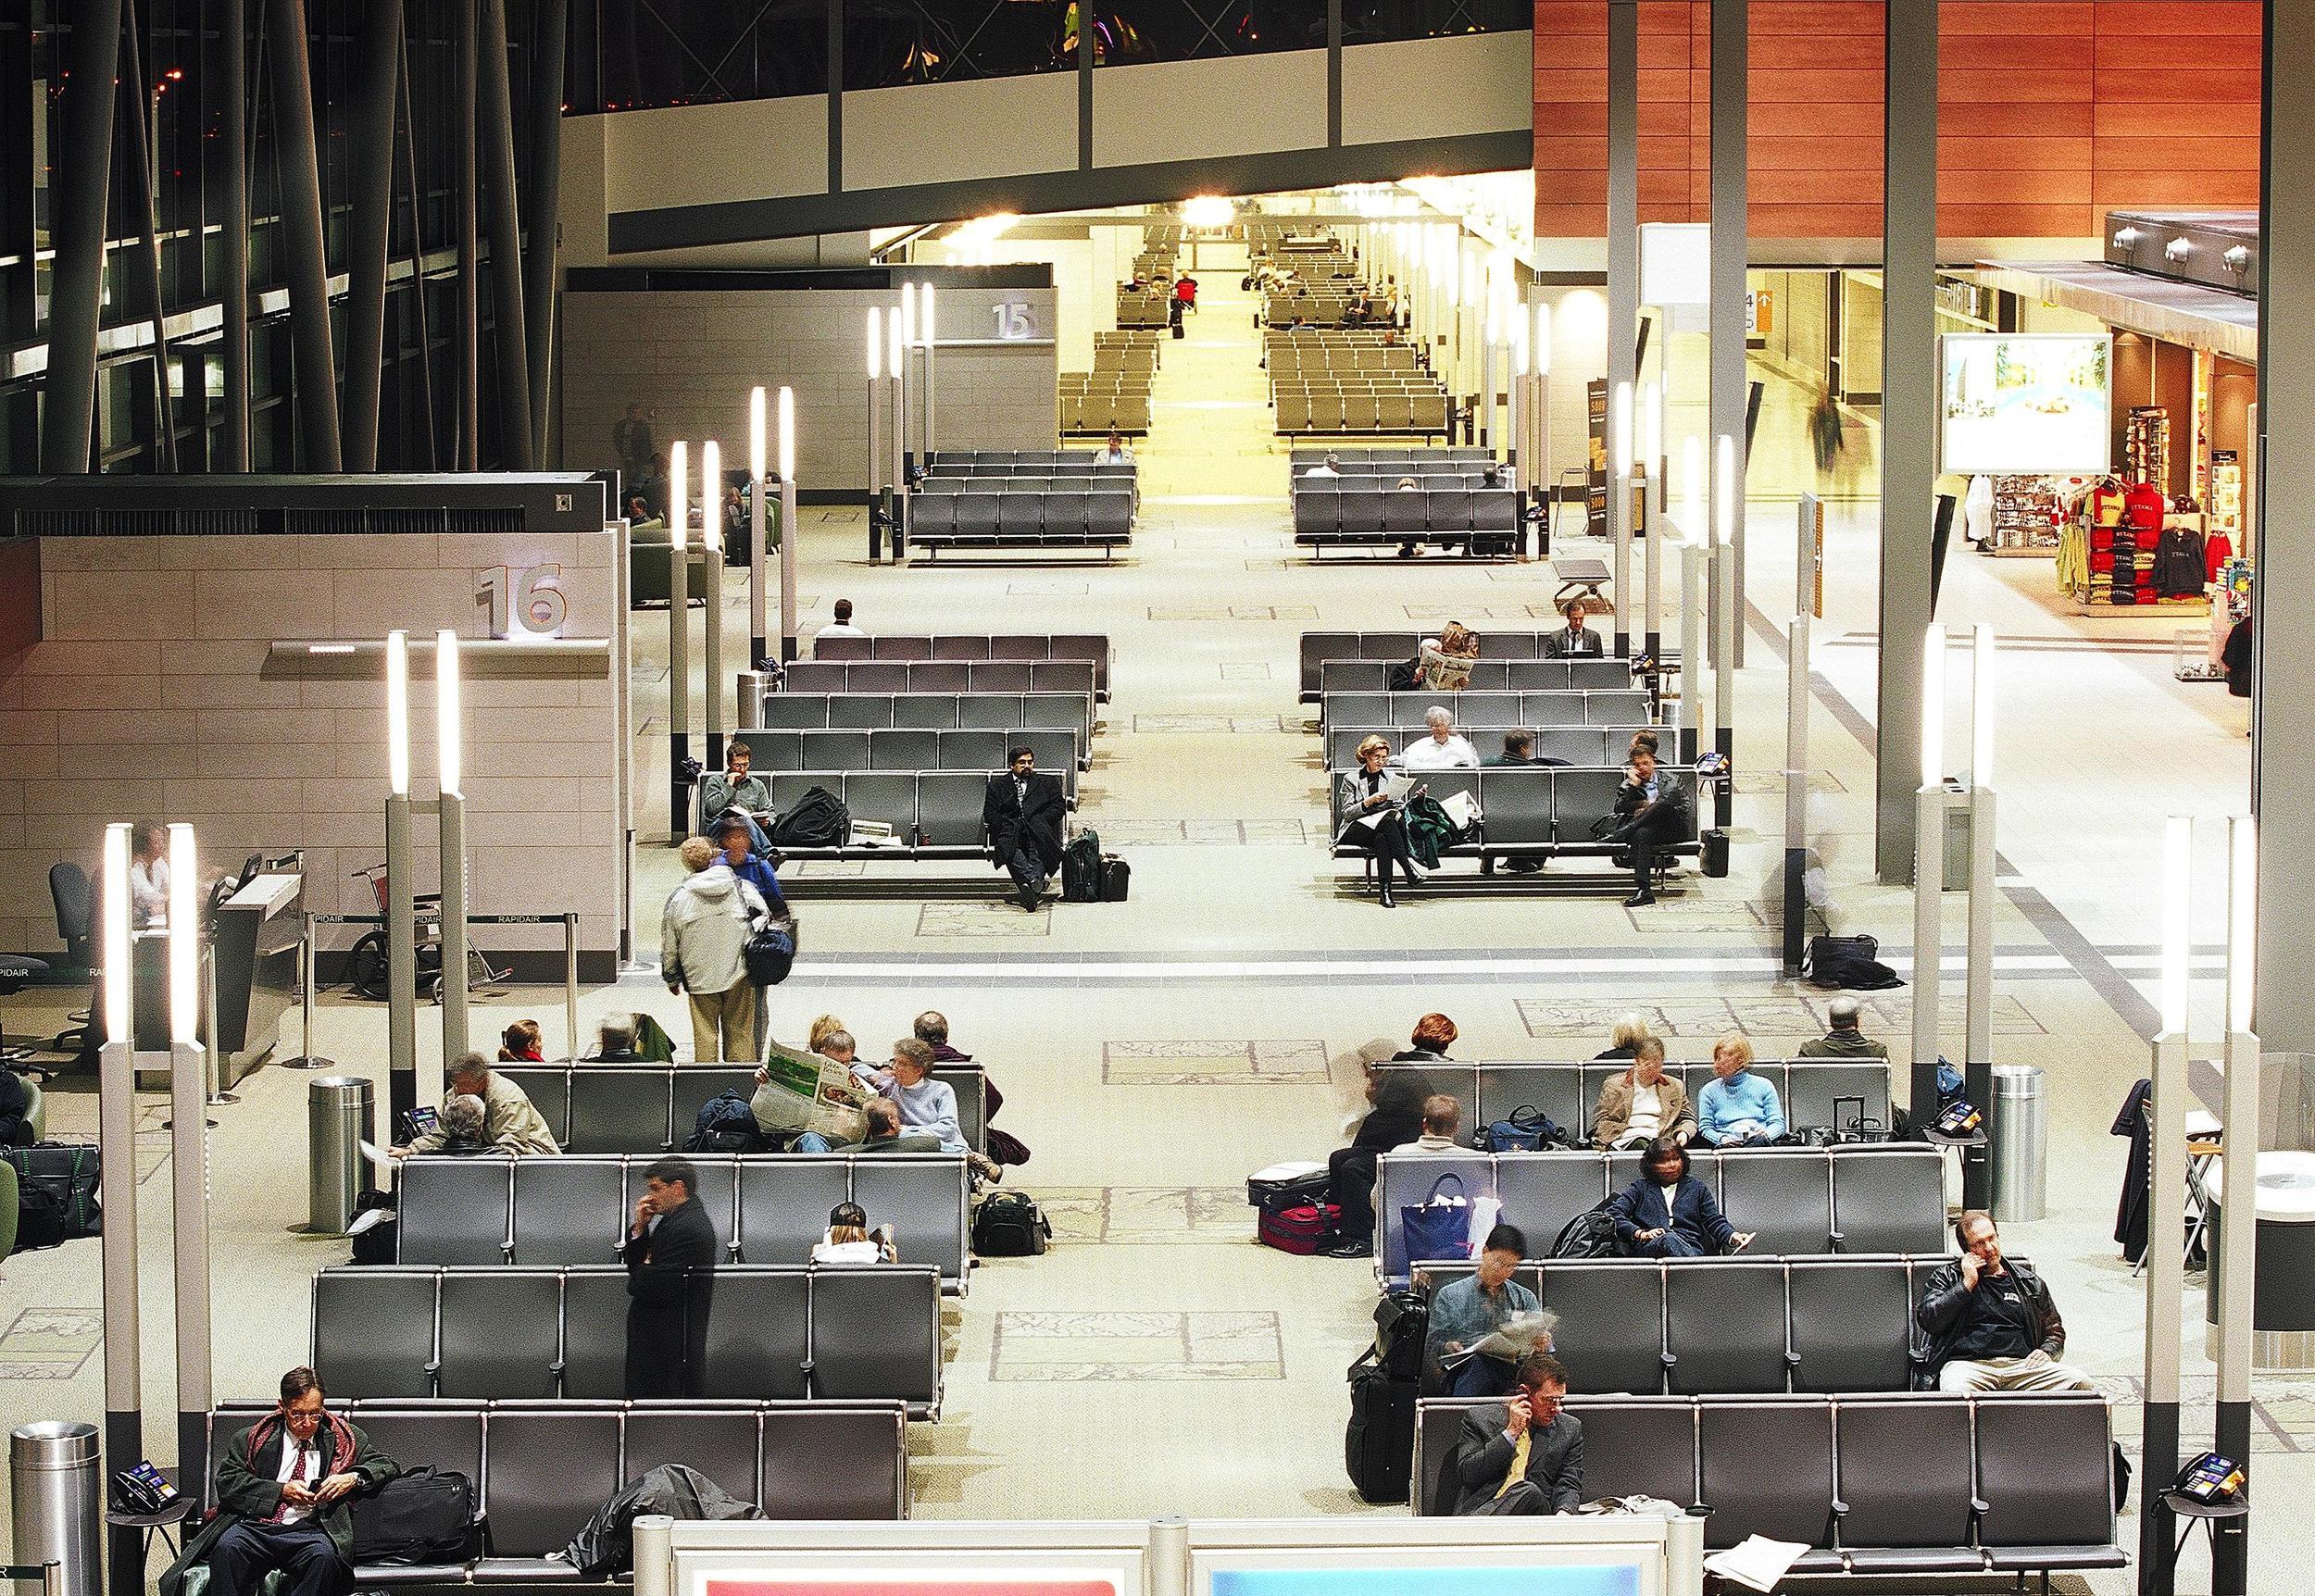 Ottawa Macdonald- Cartier InternationalAirport